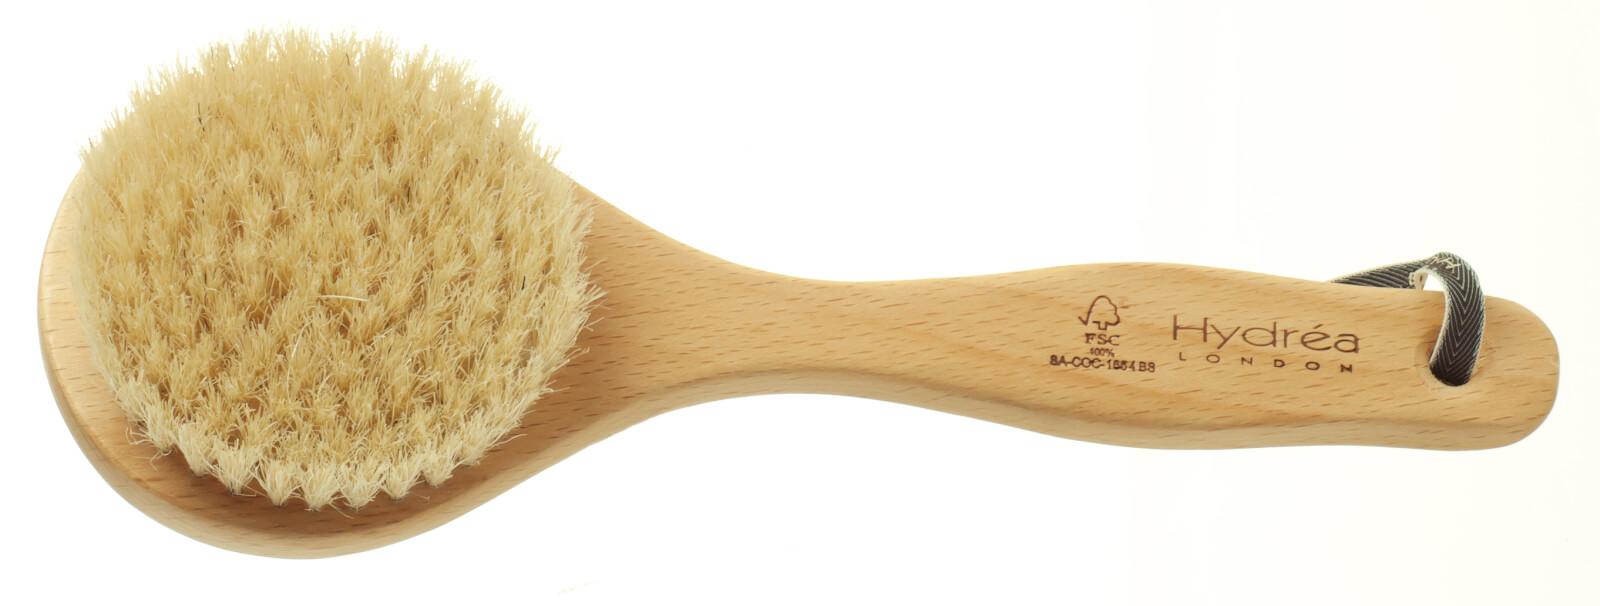 Classic Short Handled Body Brush Hydrea London